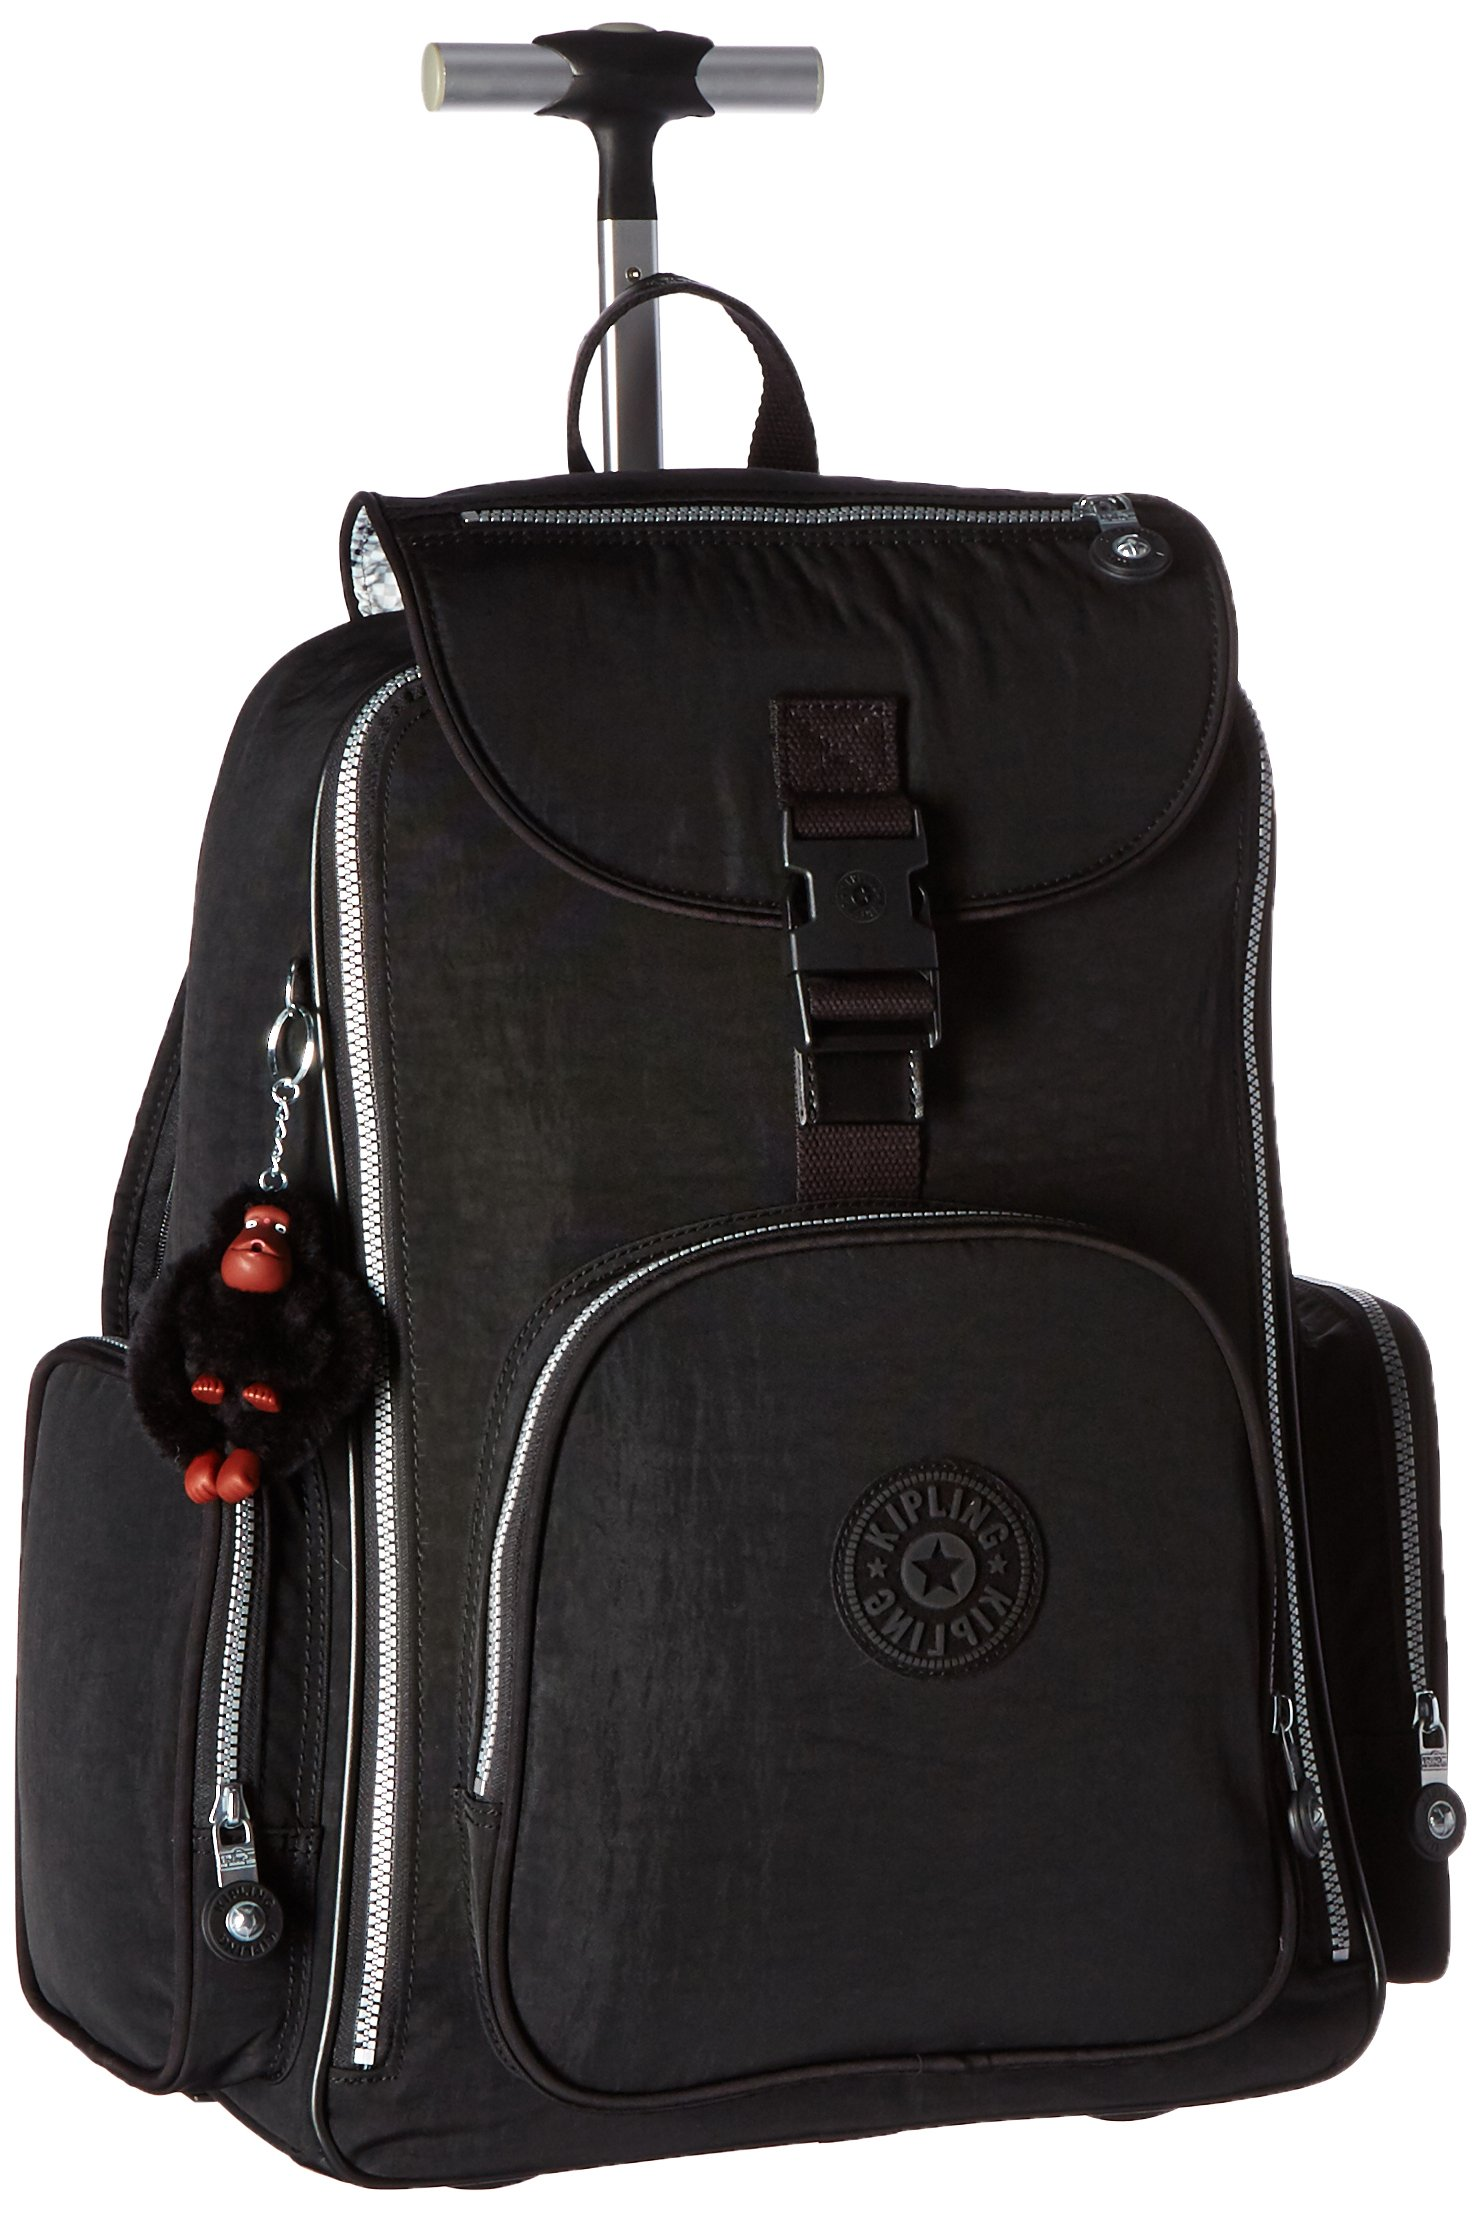 Kipling Luggage Alcatraz Wheeled Backpack with Laptop Protection, Black, One Size by Kipling